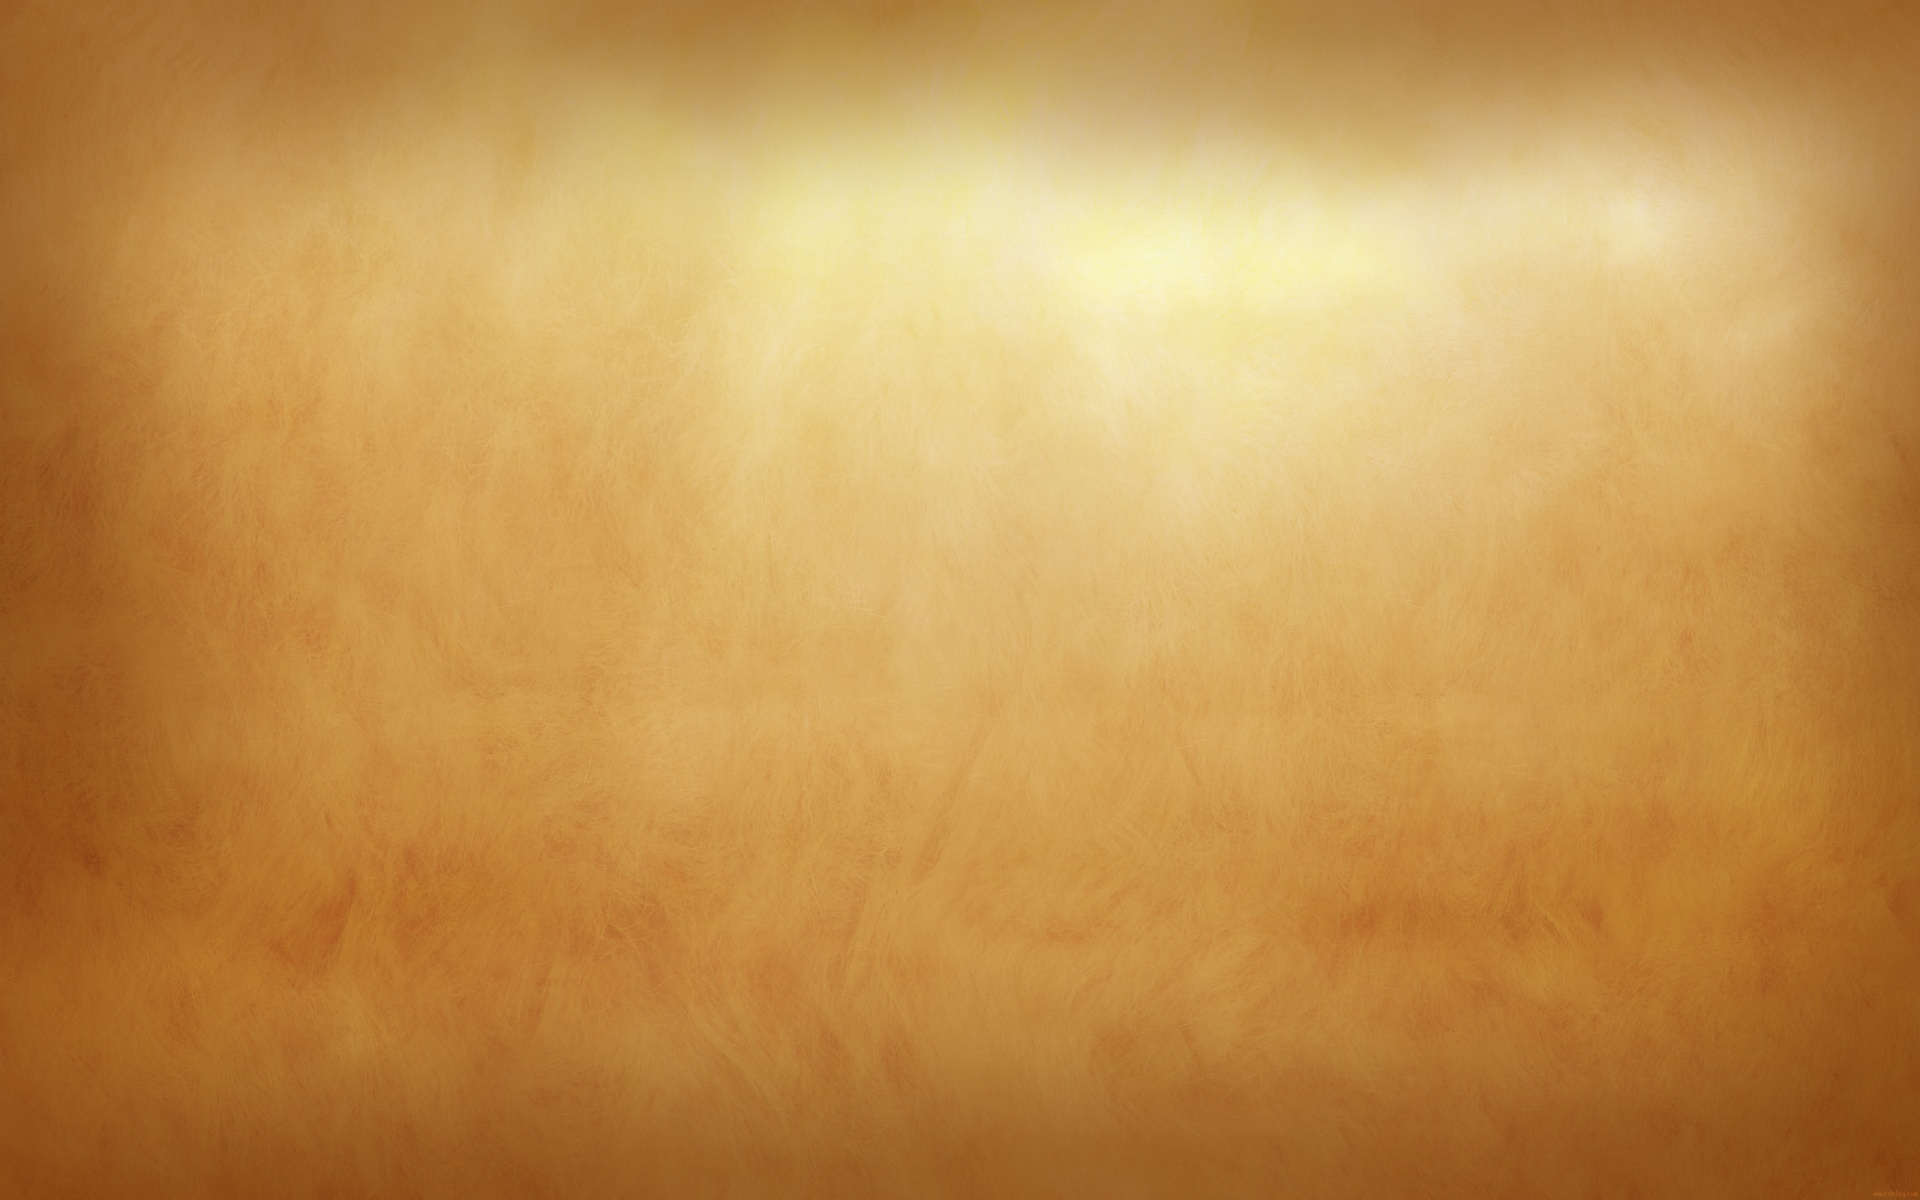 1920x1200 Brown Paper Texture desktop PC and Mac wallpaper 1920x1200